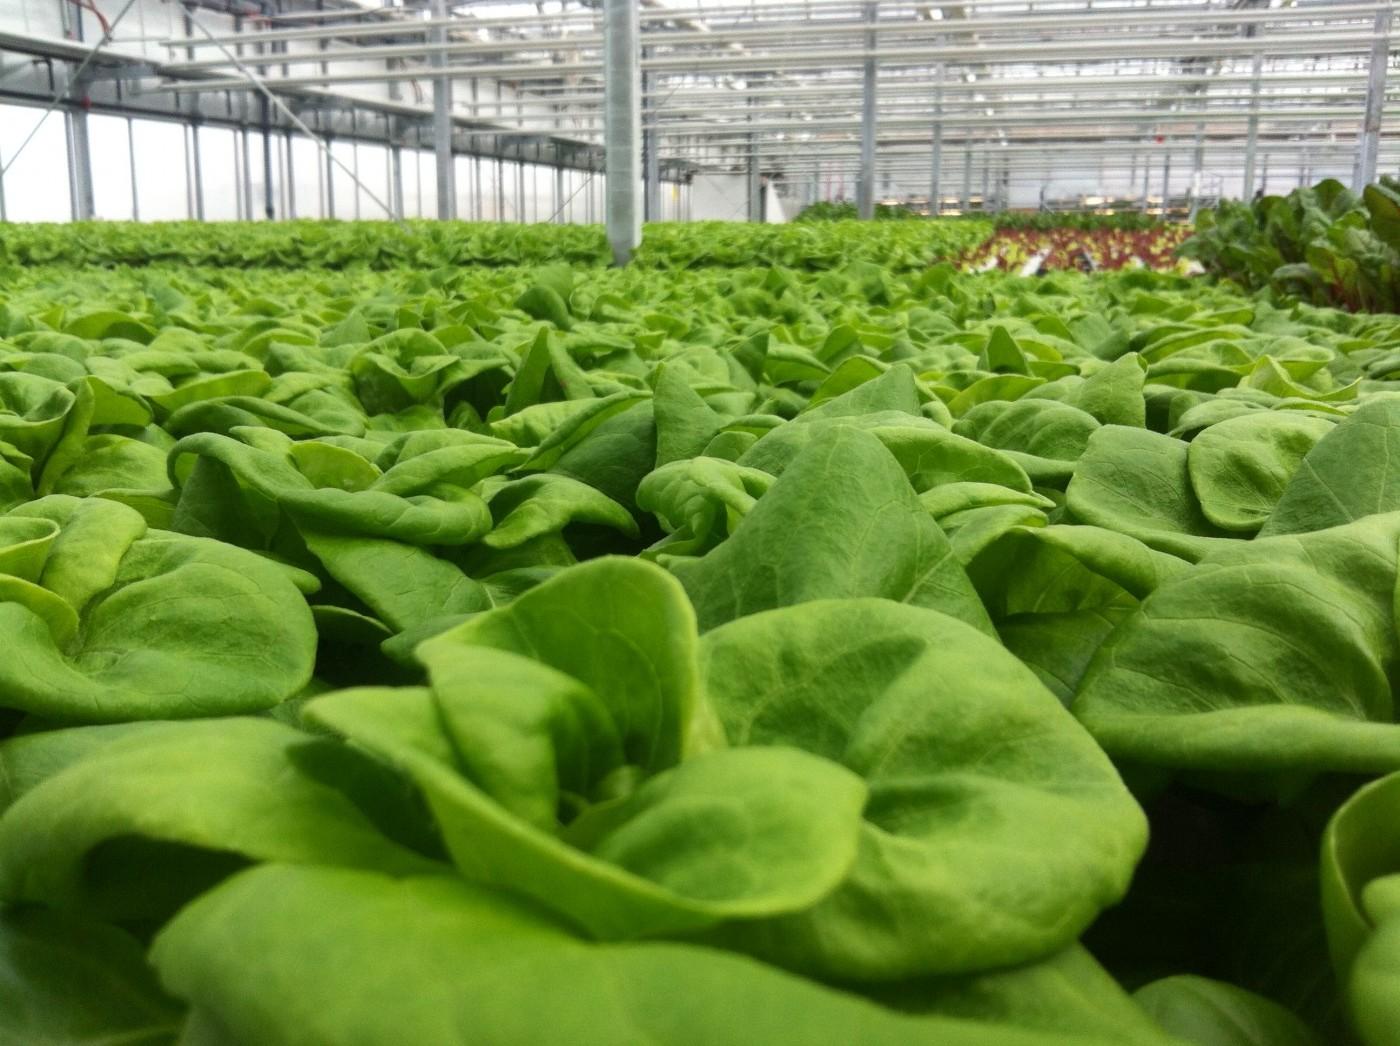 Lufa Farms חממות גידול הידרופוניות במונטריאול, קנדה 4